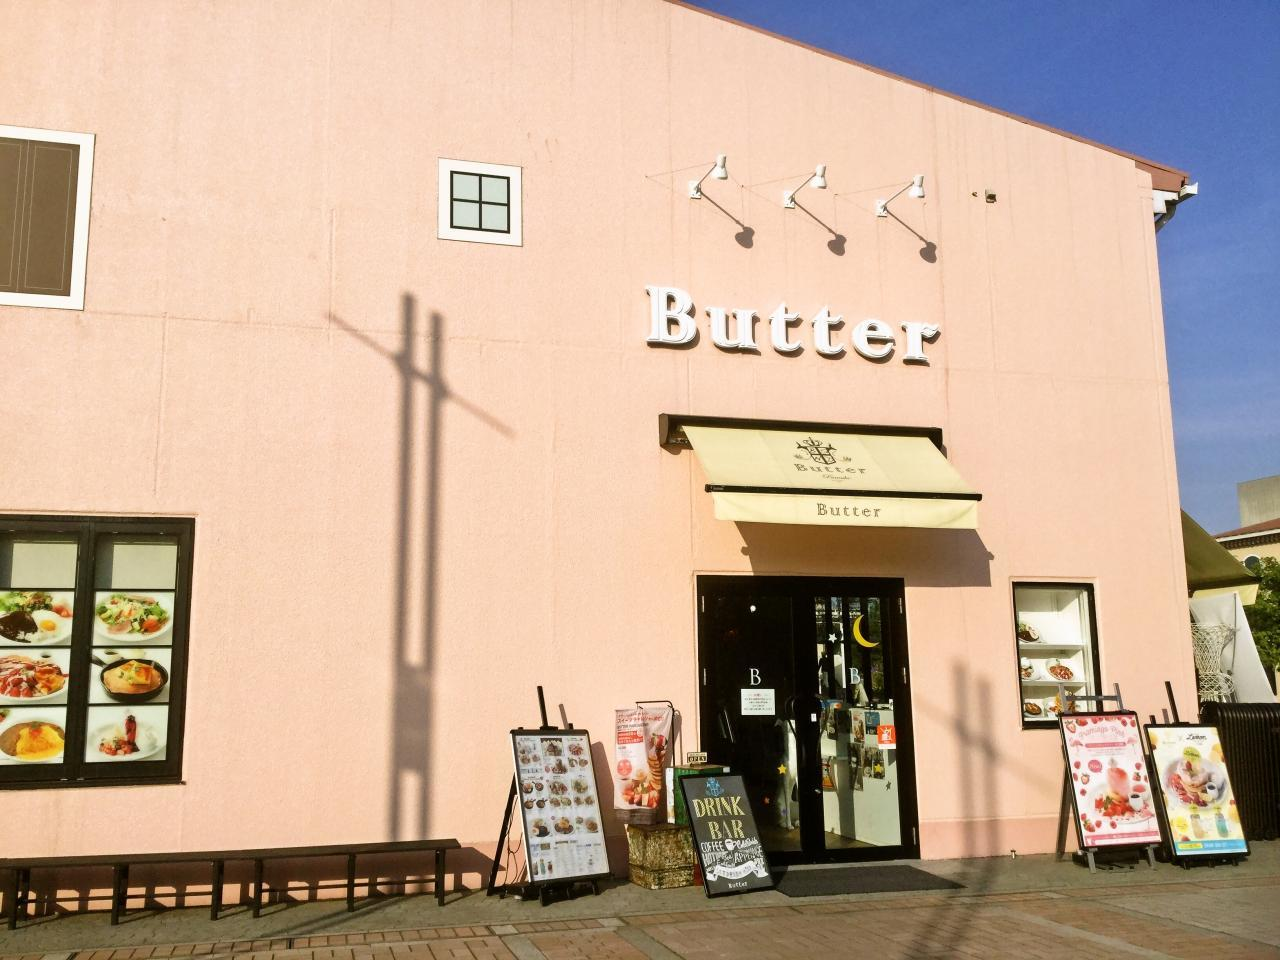 Butter 三井アウトレットパーク多摩南大沢(店舗)